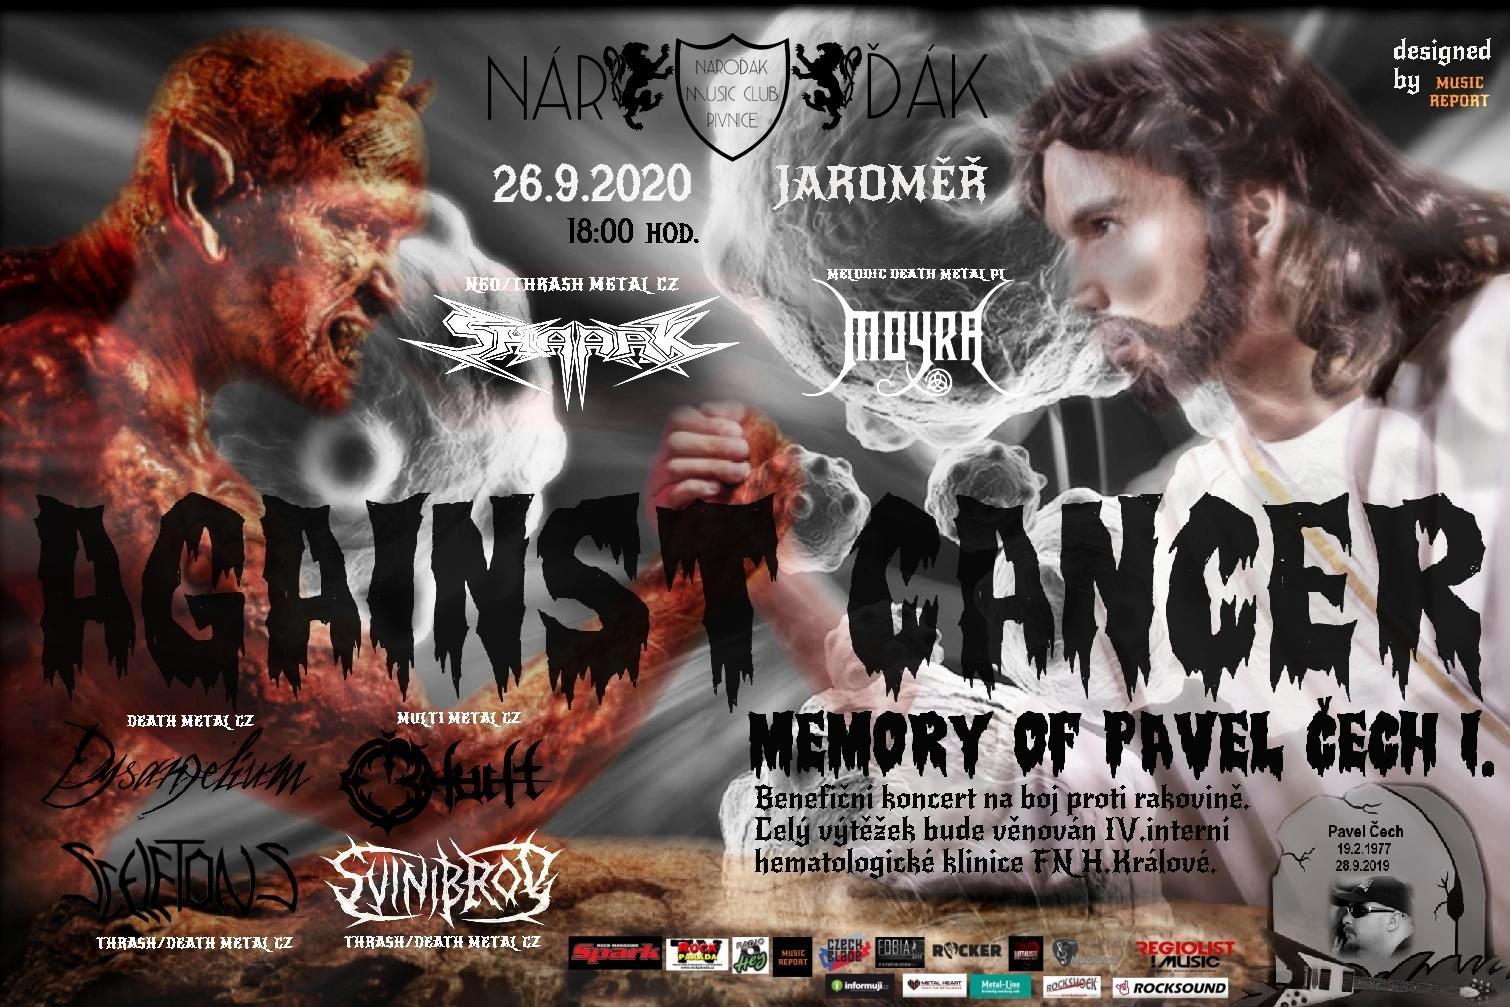 Against Cancer Memory of Pavel Čech Vol I.